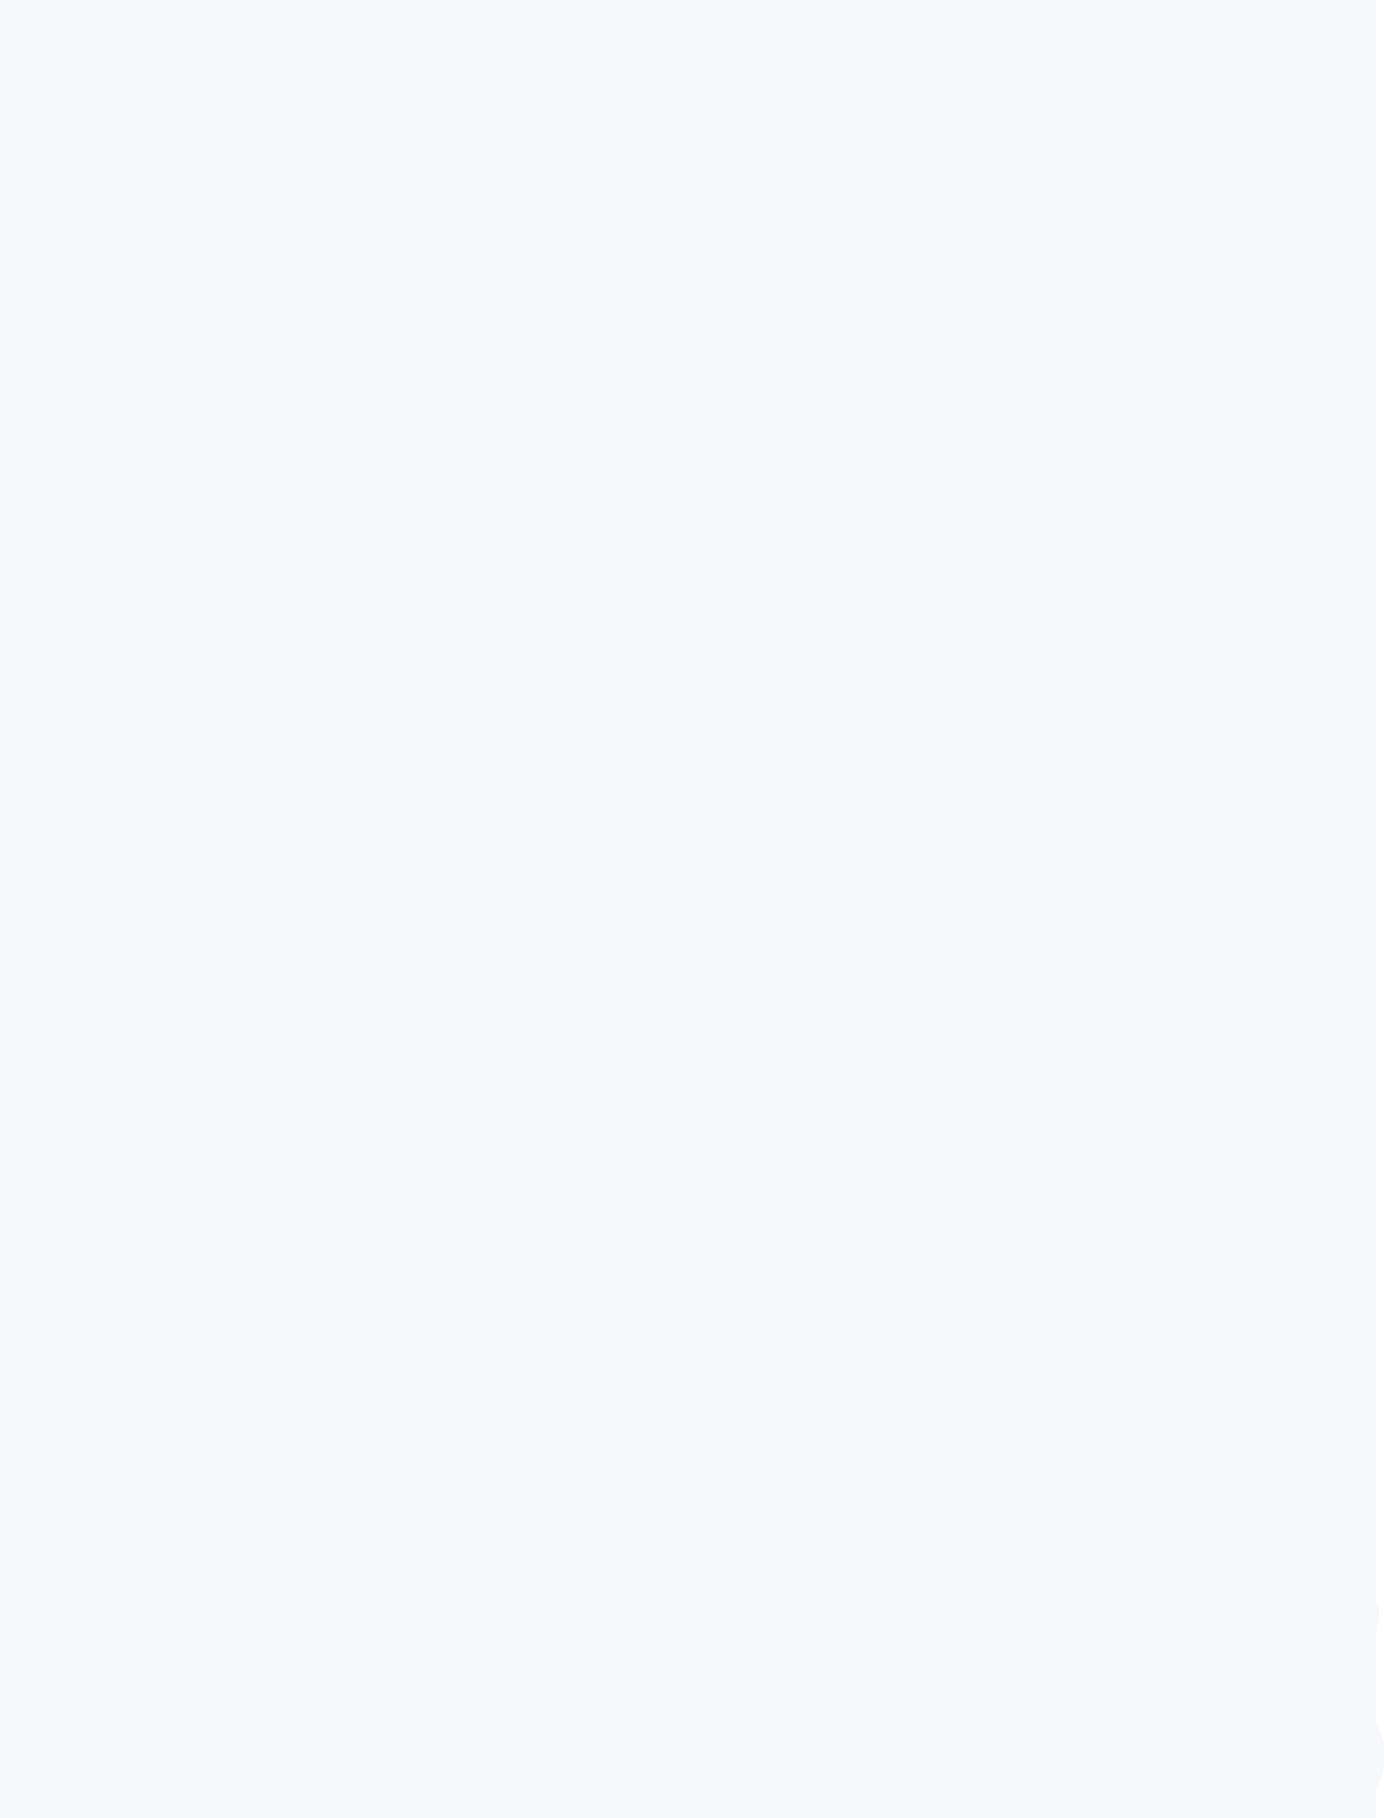 Watkins Publishing